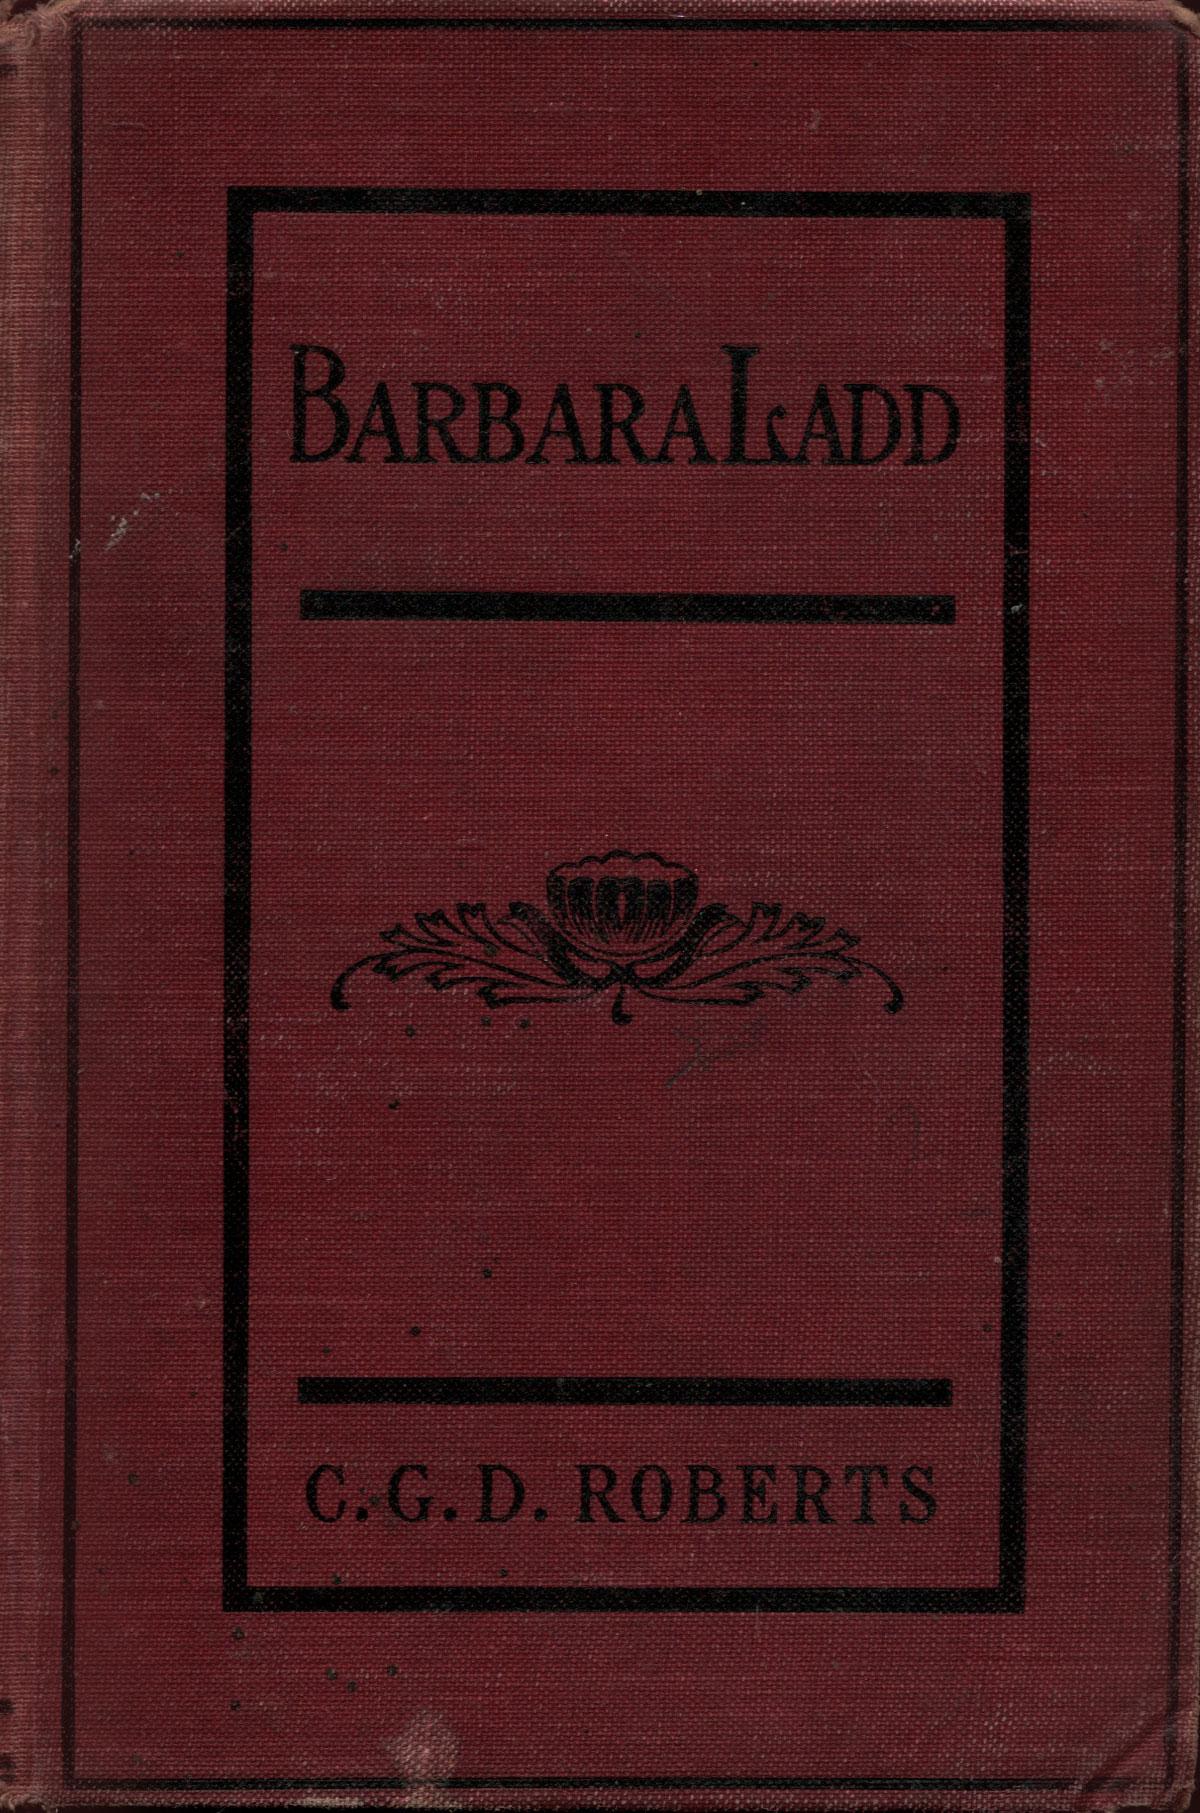 Barbara Ladd